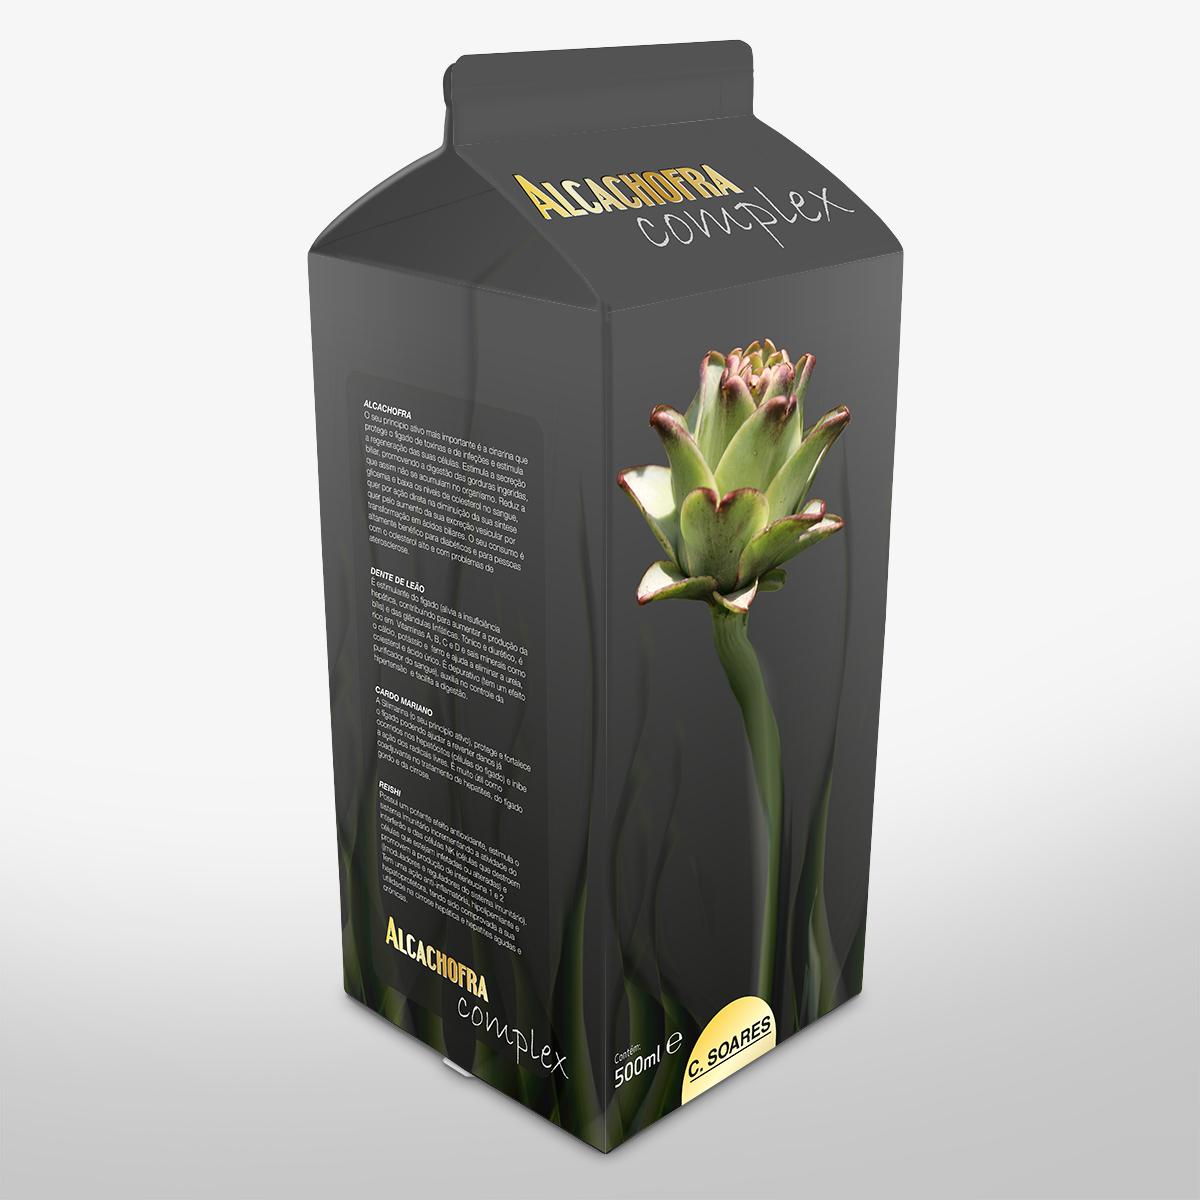 box design package design